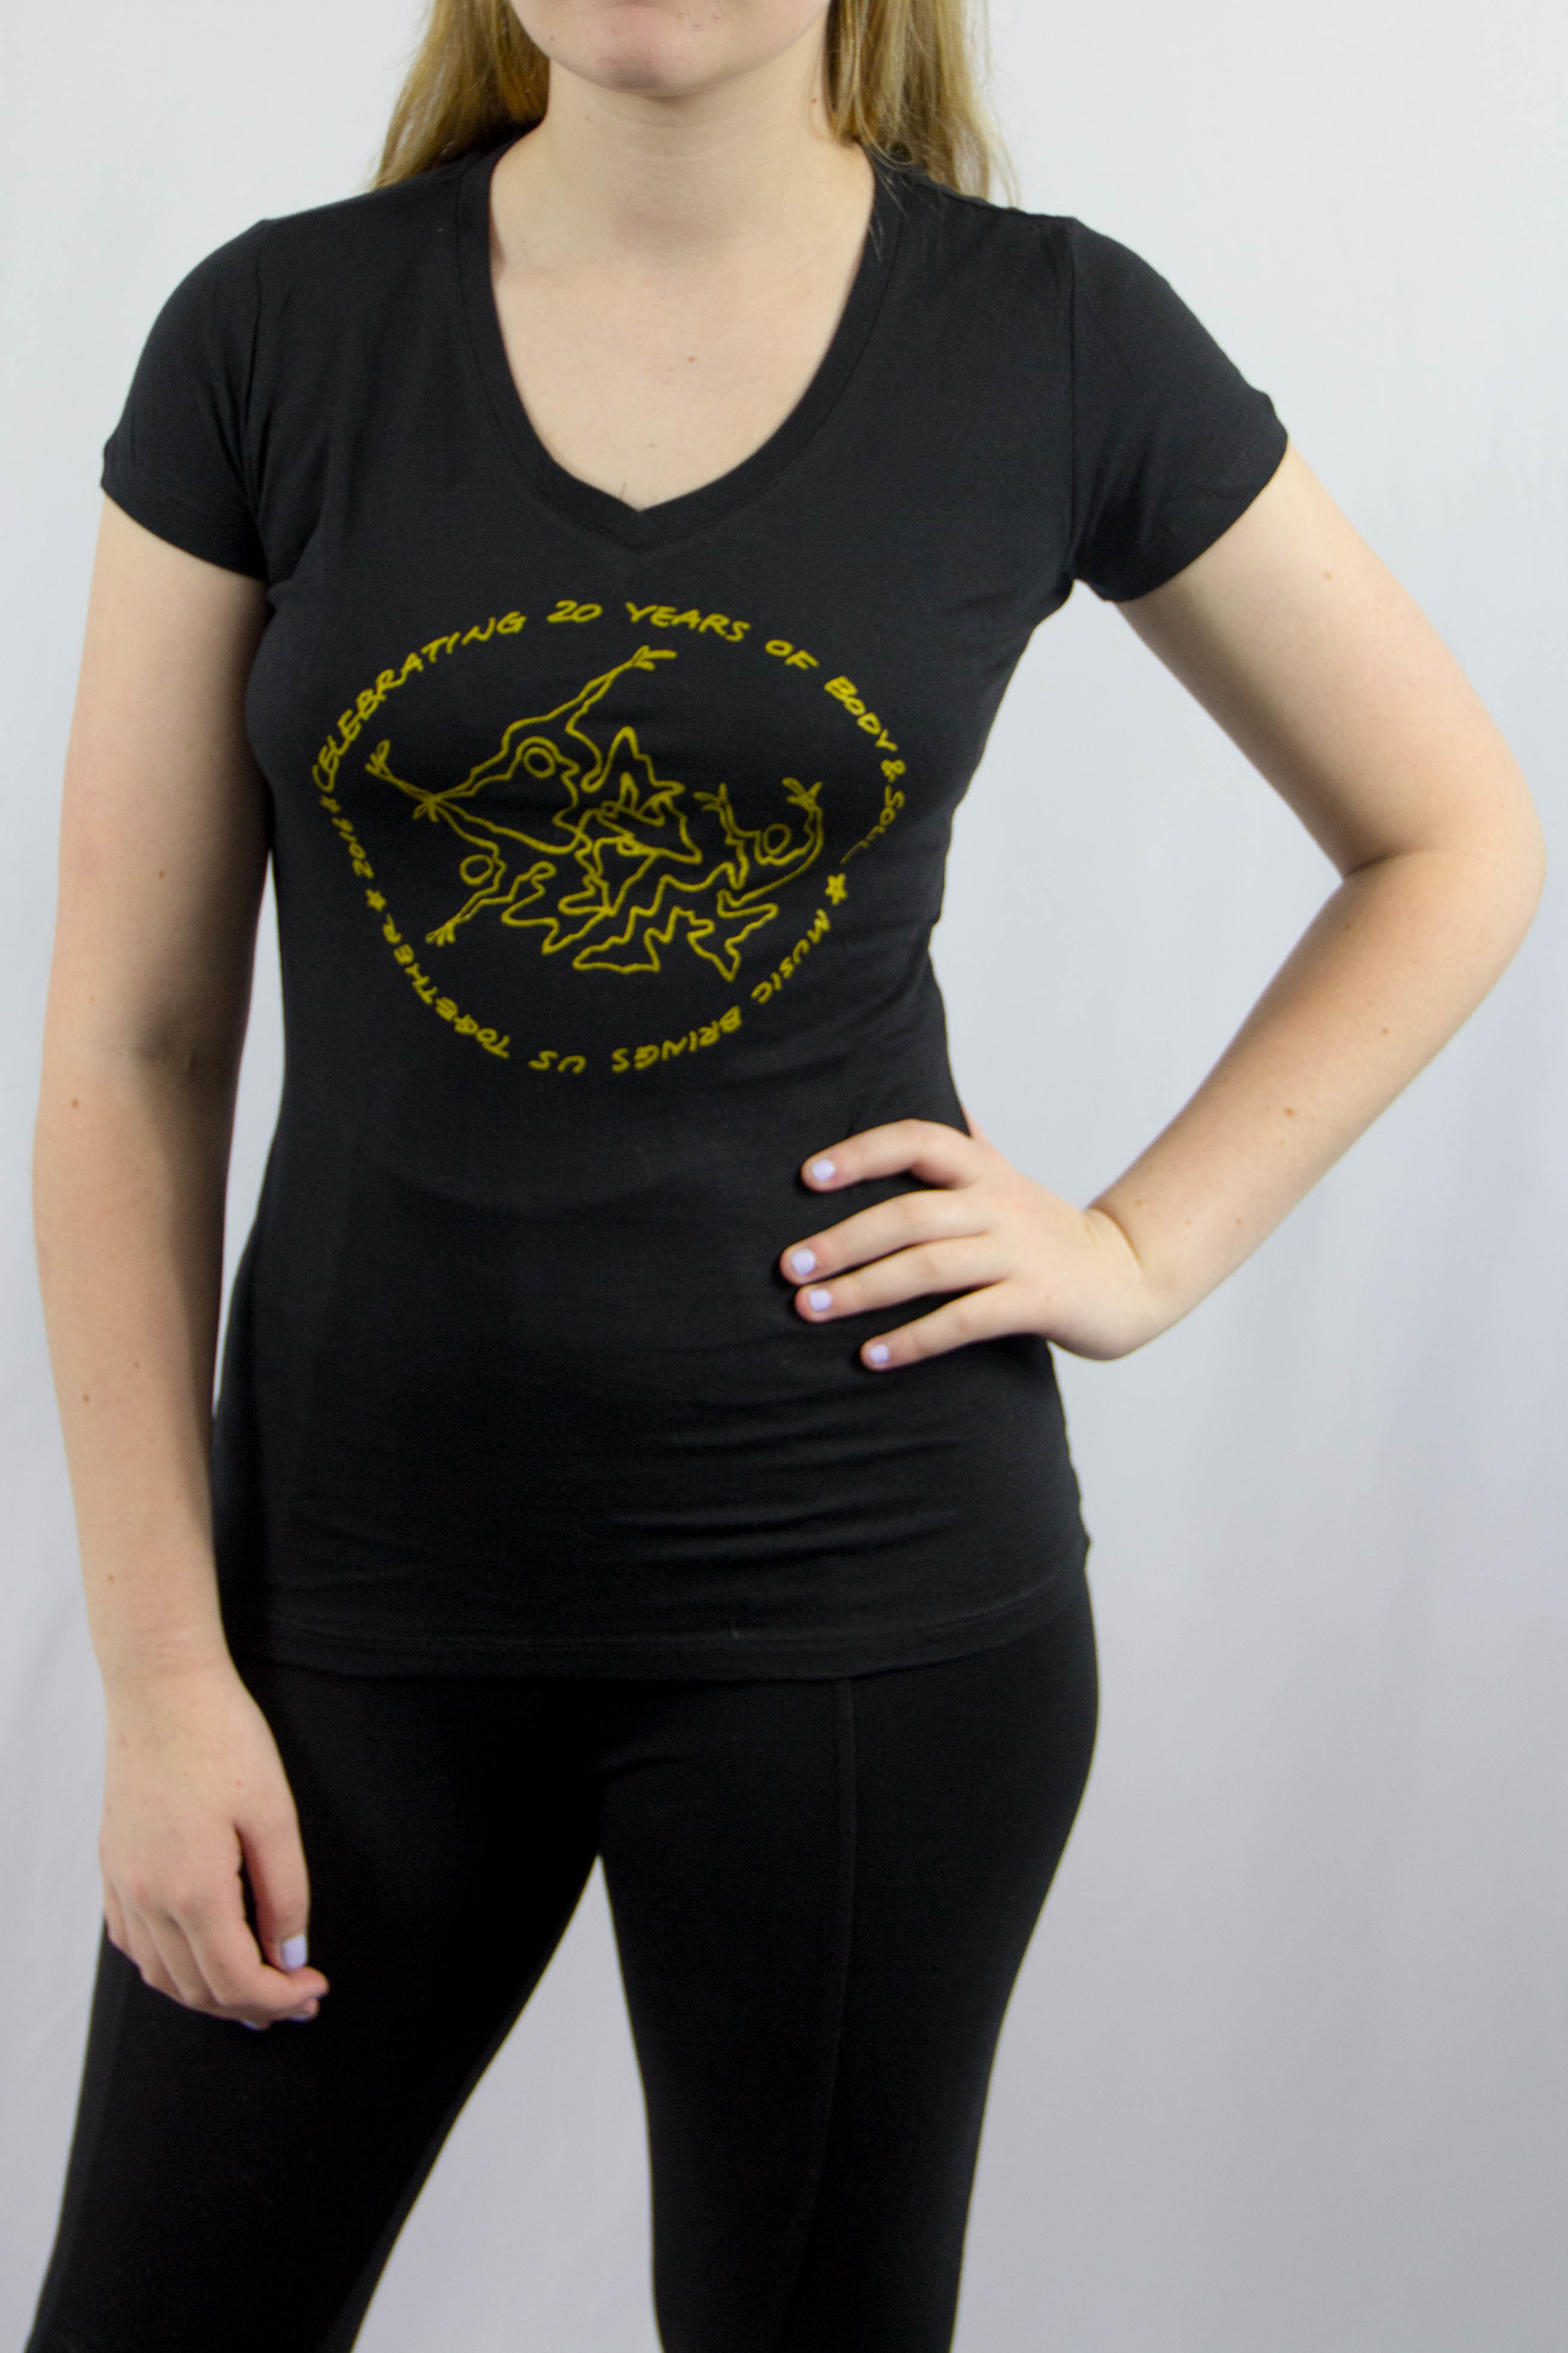 Women V-neck 20th Anniv Black w/ Gold Ink S QII5CAXMDEREQTJD6URFOW7X